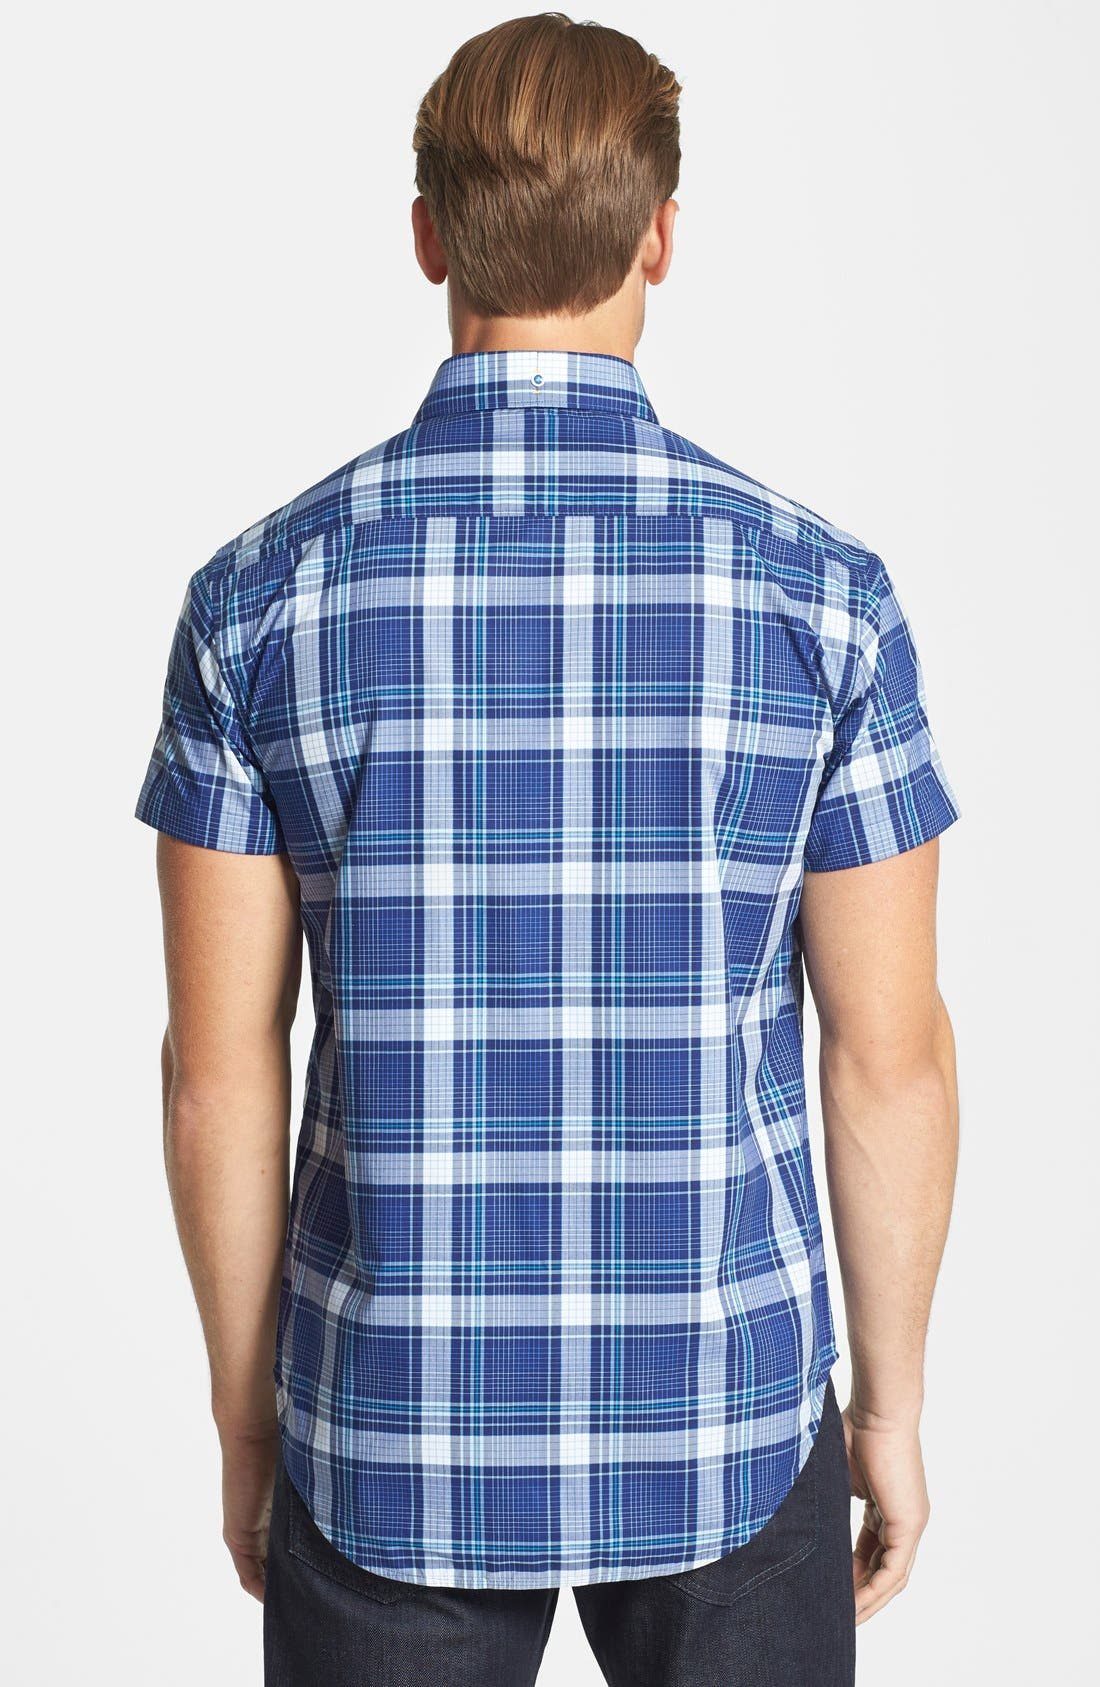 Alternate Image 3  - Robert Graham 'Sandstone' Tailored Fit Cotton Short Sleeve Sport Shirt